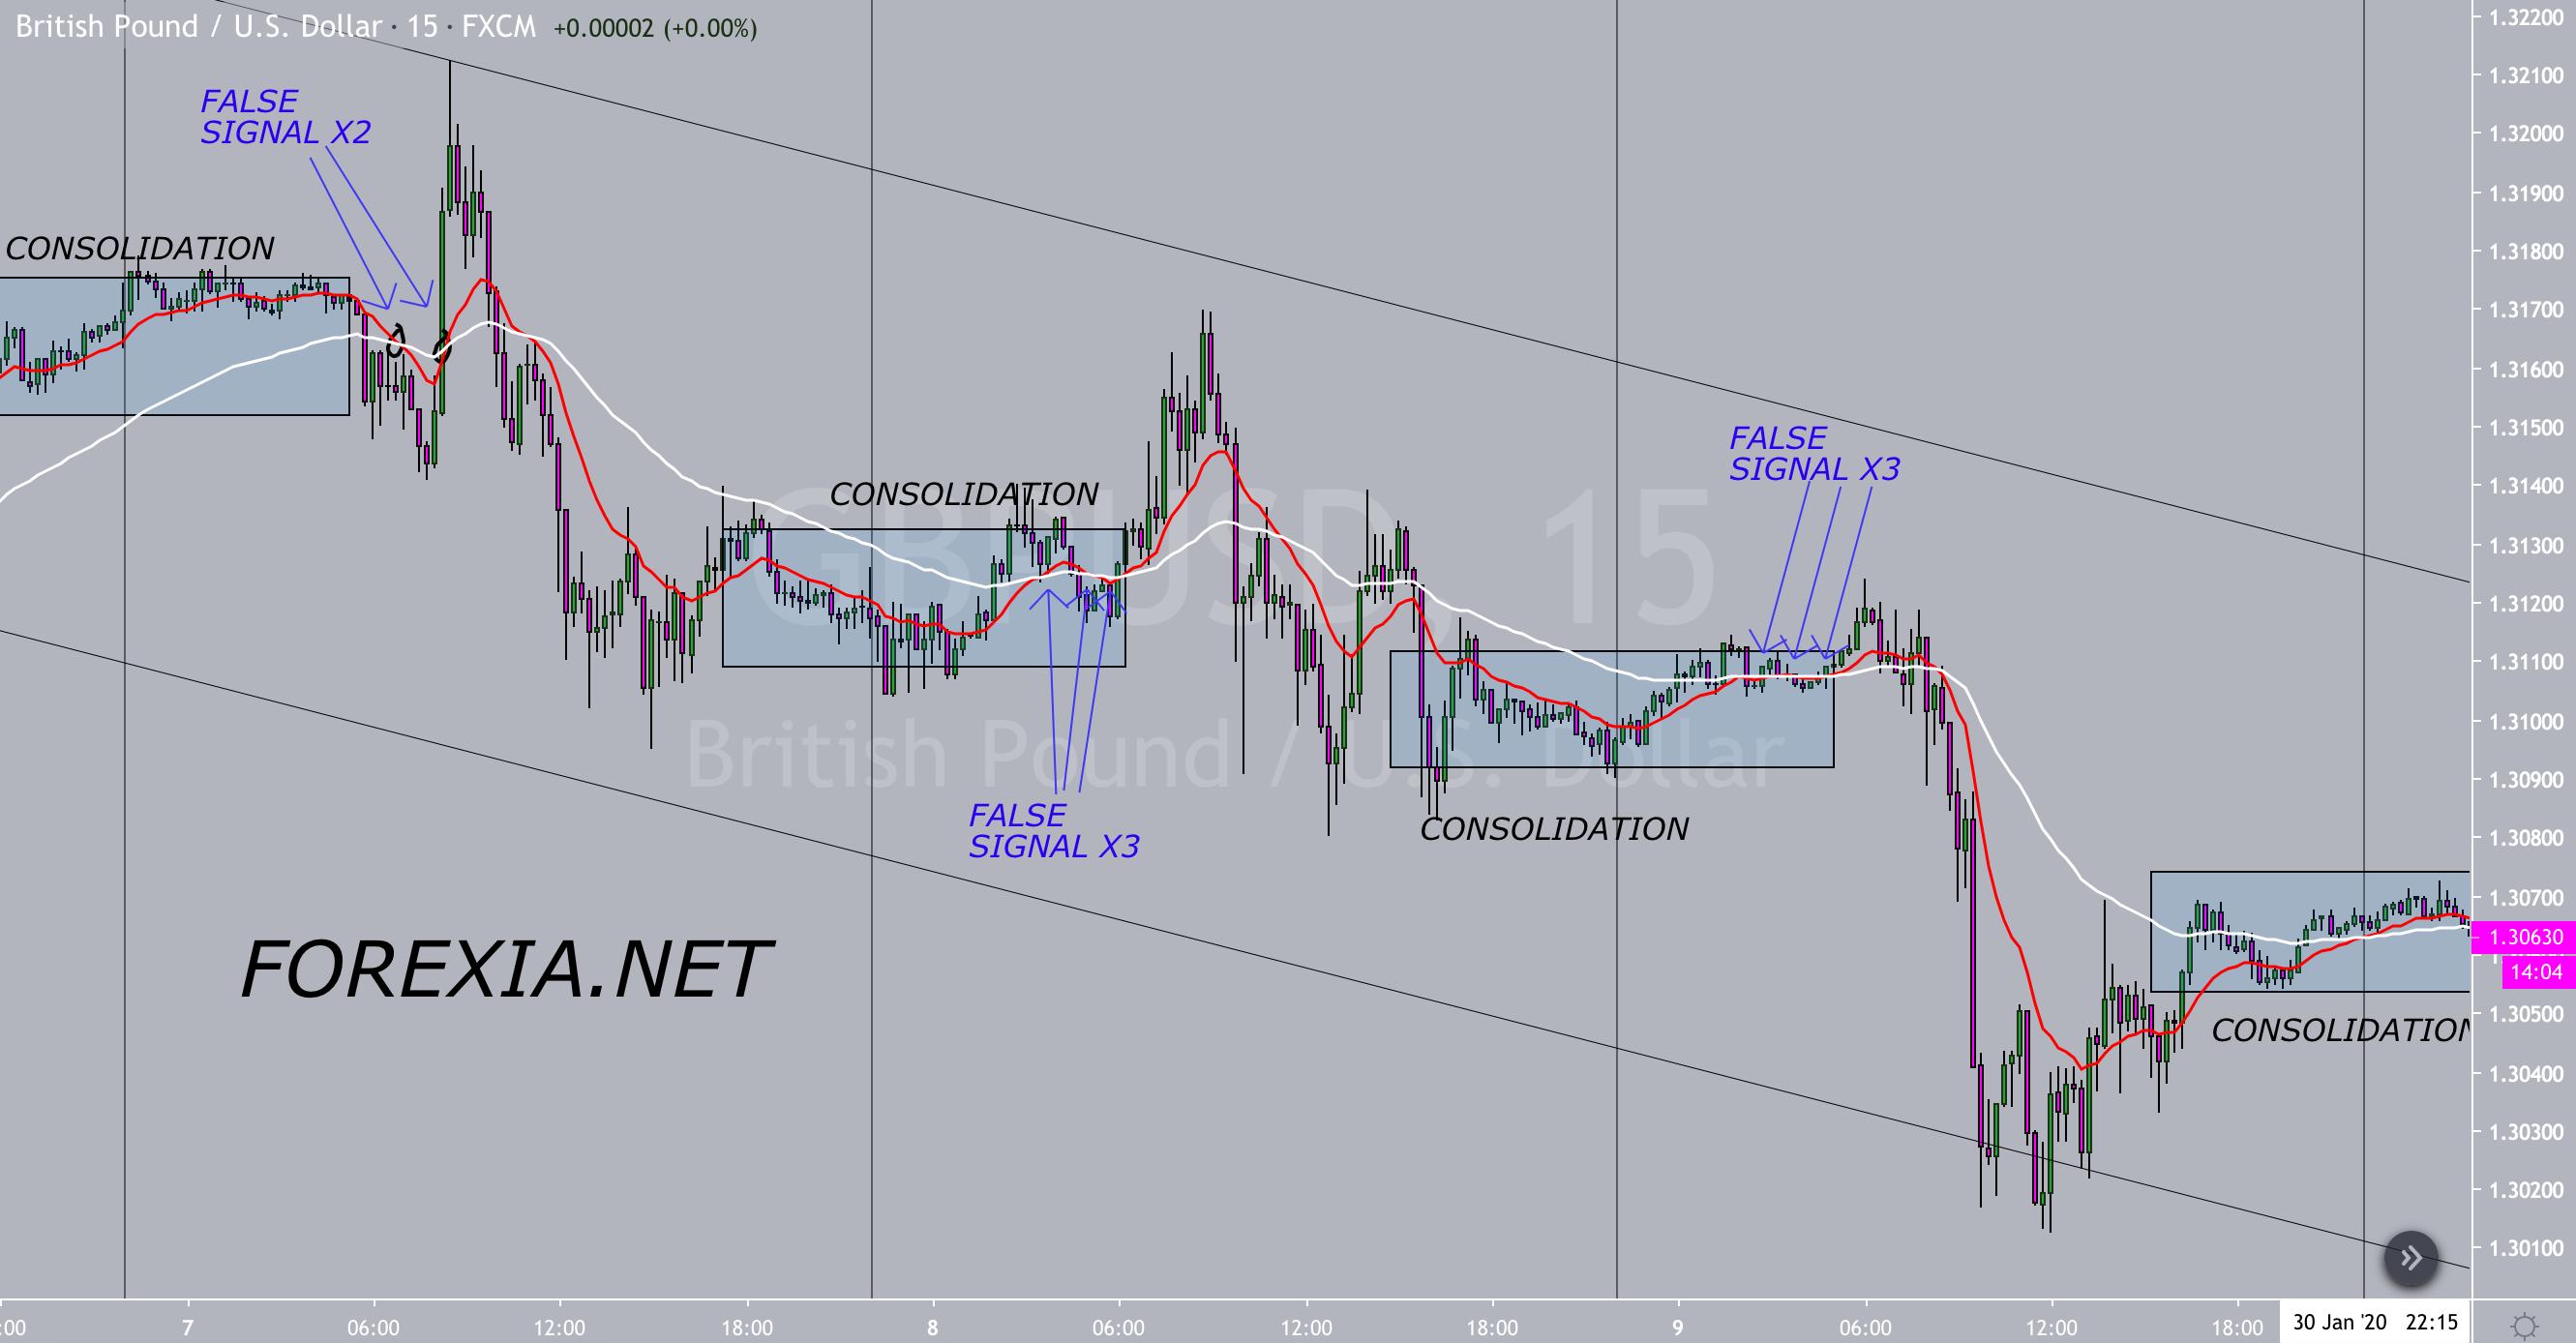 Market Manipulation: Consolidation vs Indicators